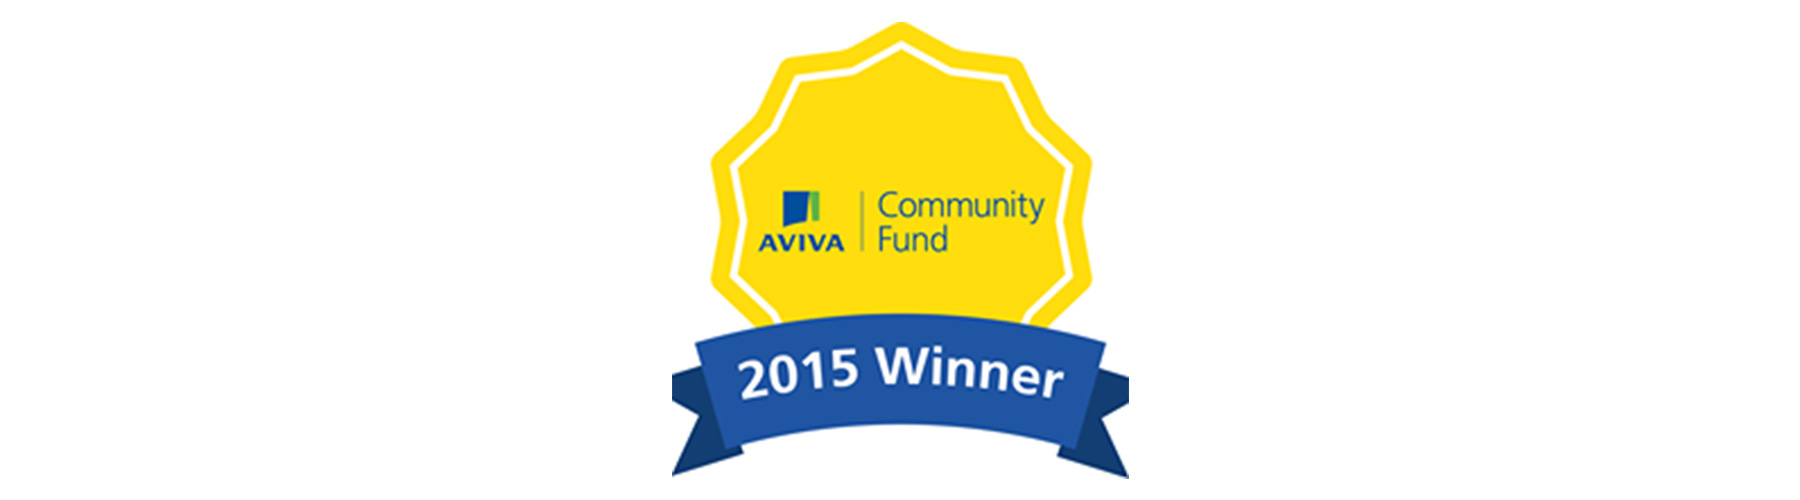 We Are a Winner with Aviva